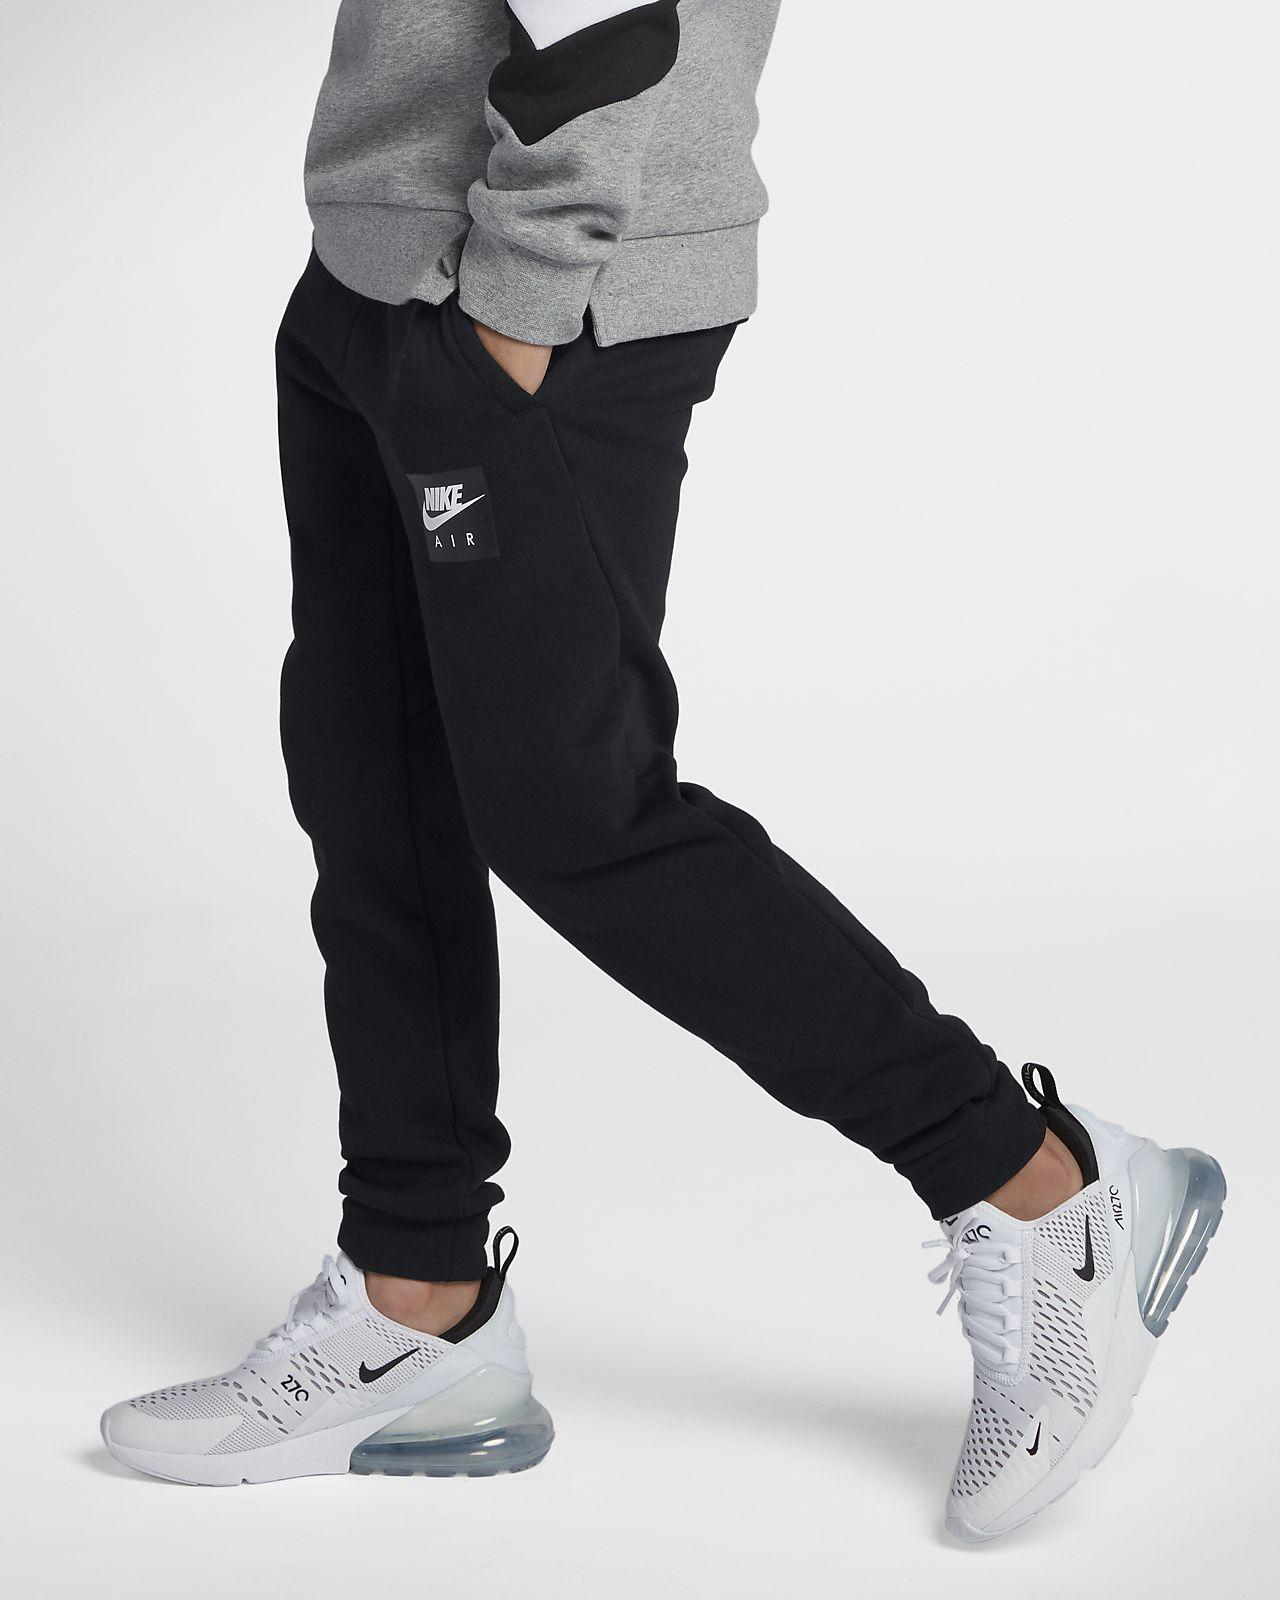 b80d2c9e Nike Air bukse for store barn (gutt). Nike.com NO